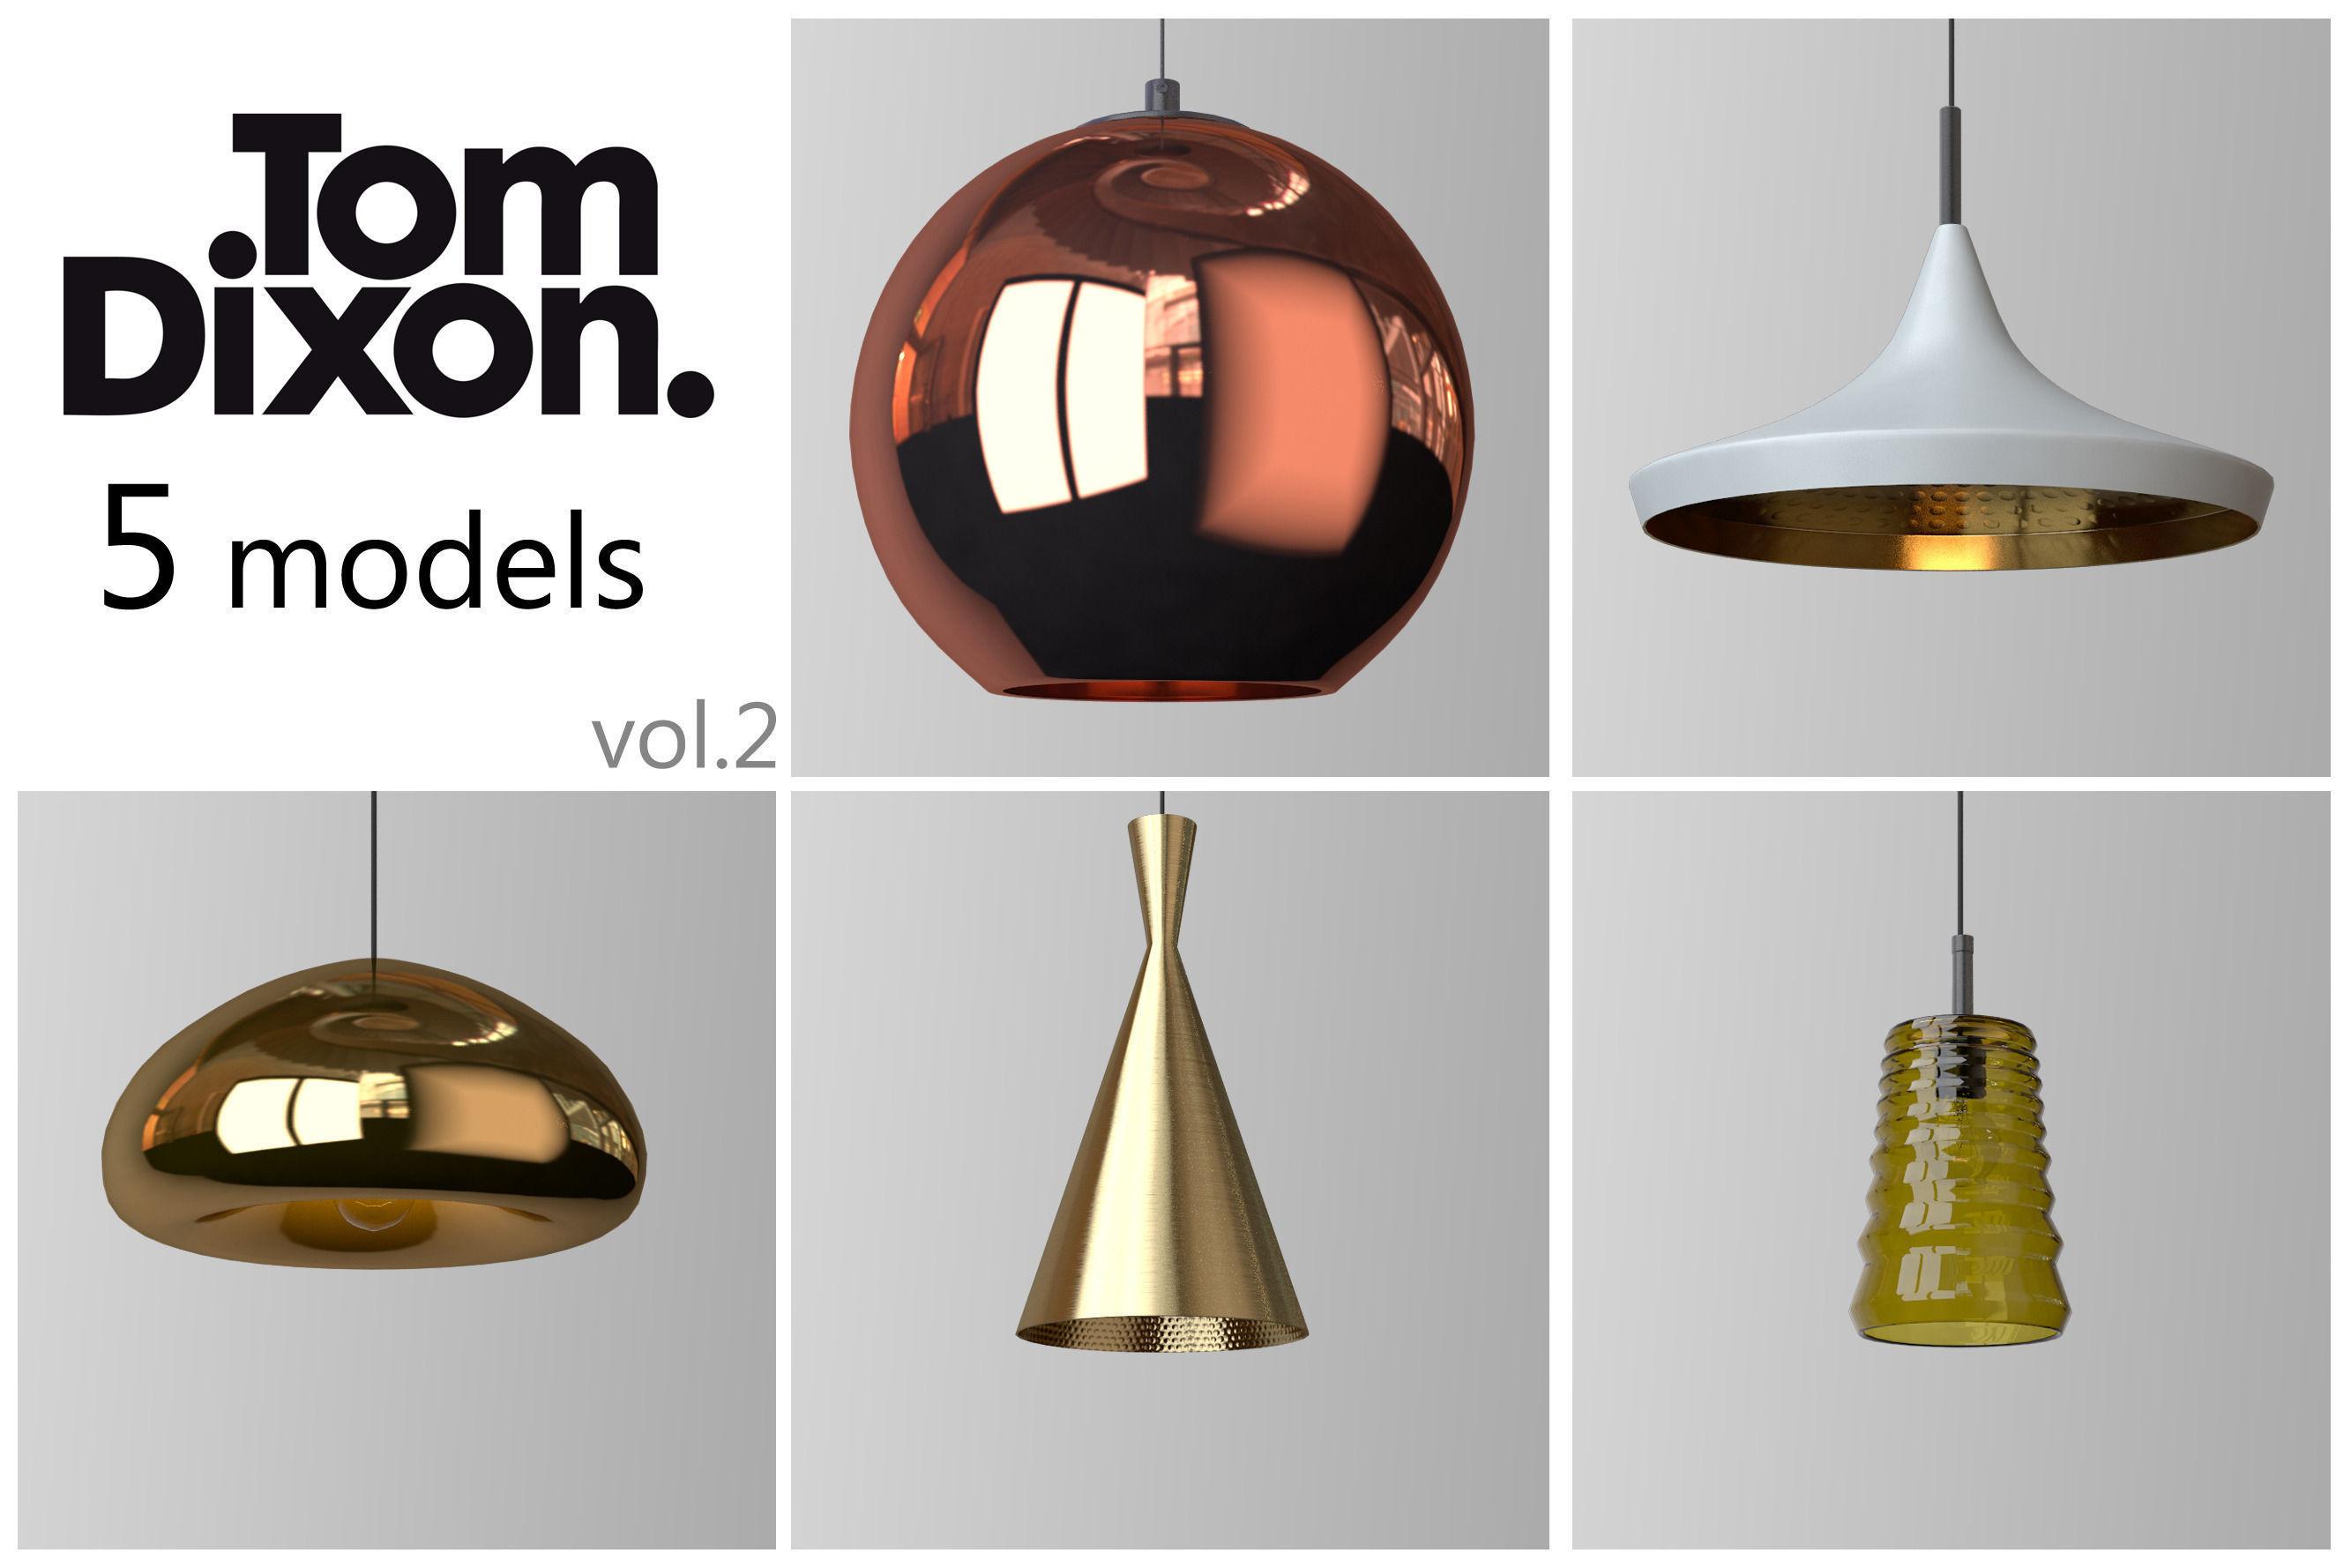 D Model Tom Dixon Lighting Set Cgtrader Tom Dixon Lighting Set D Model Max  With Lampe Tom Dixon